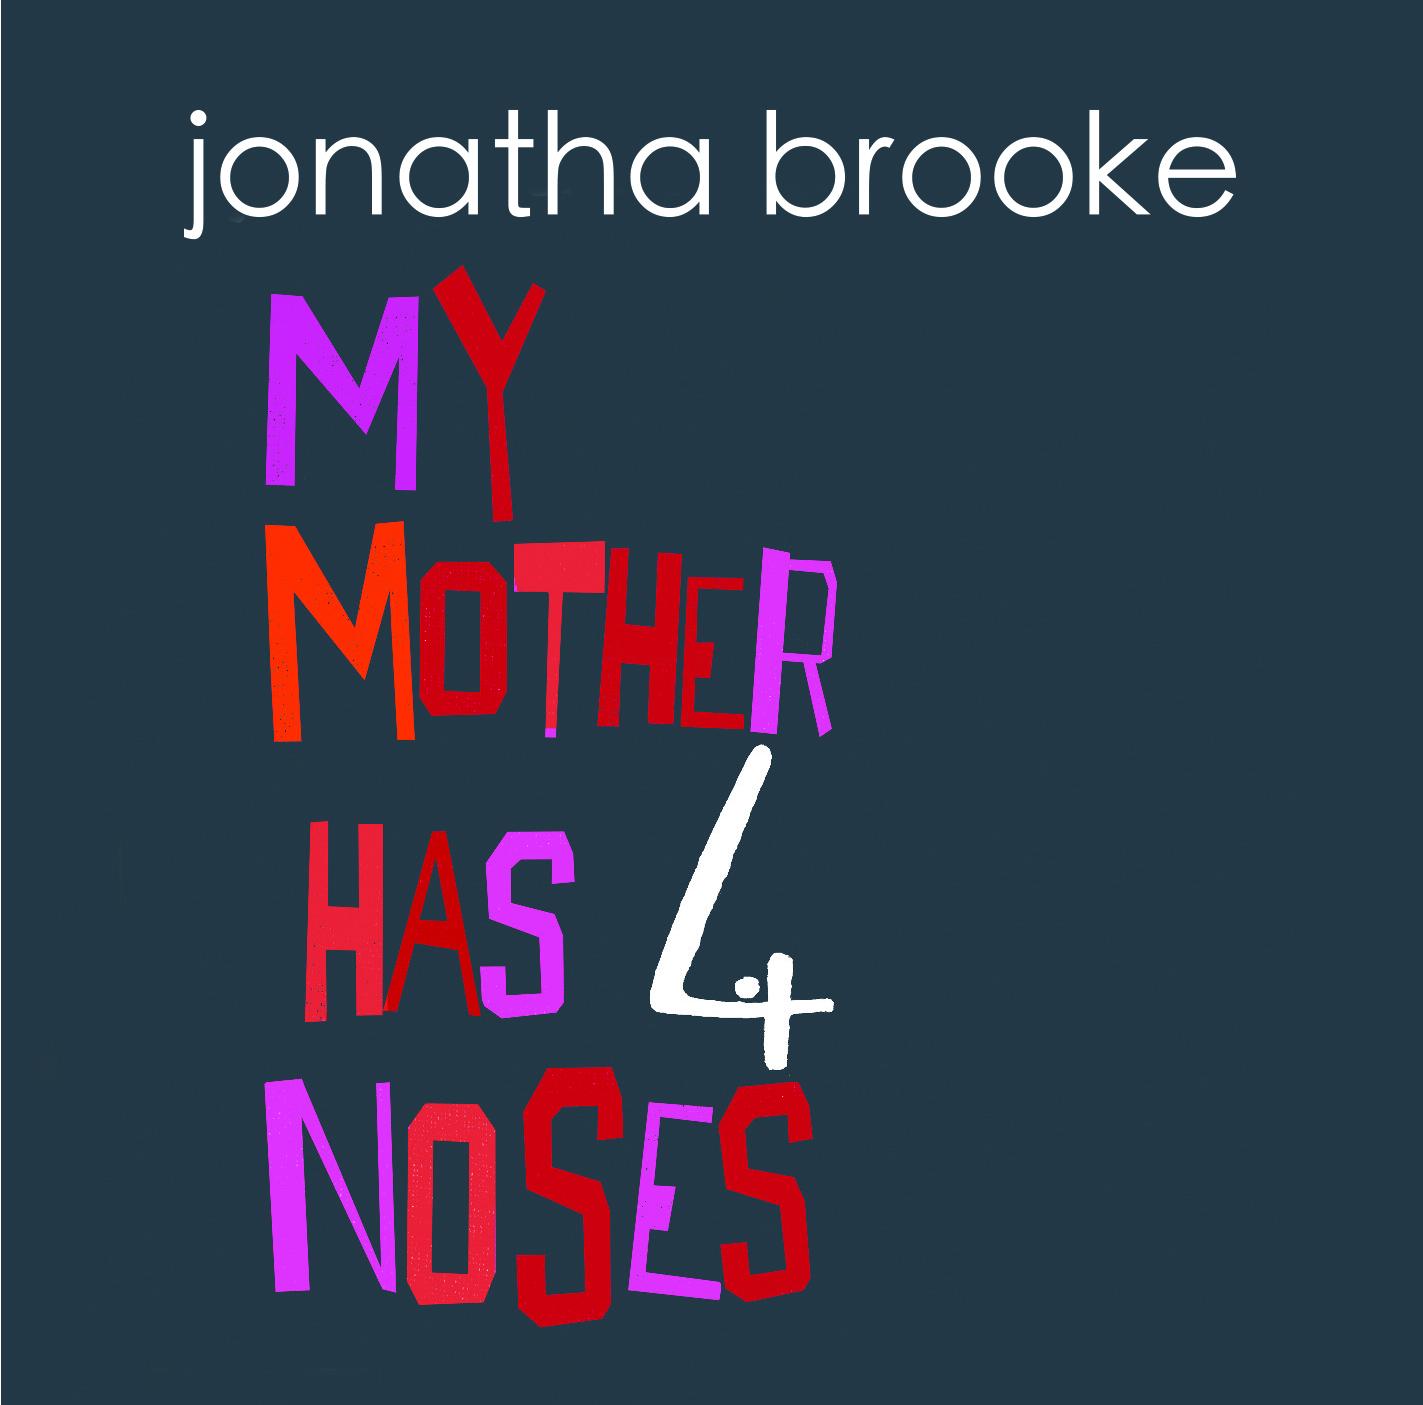 jonatha new covers